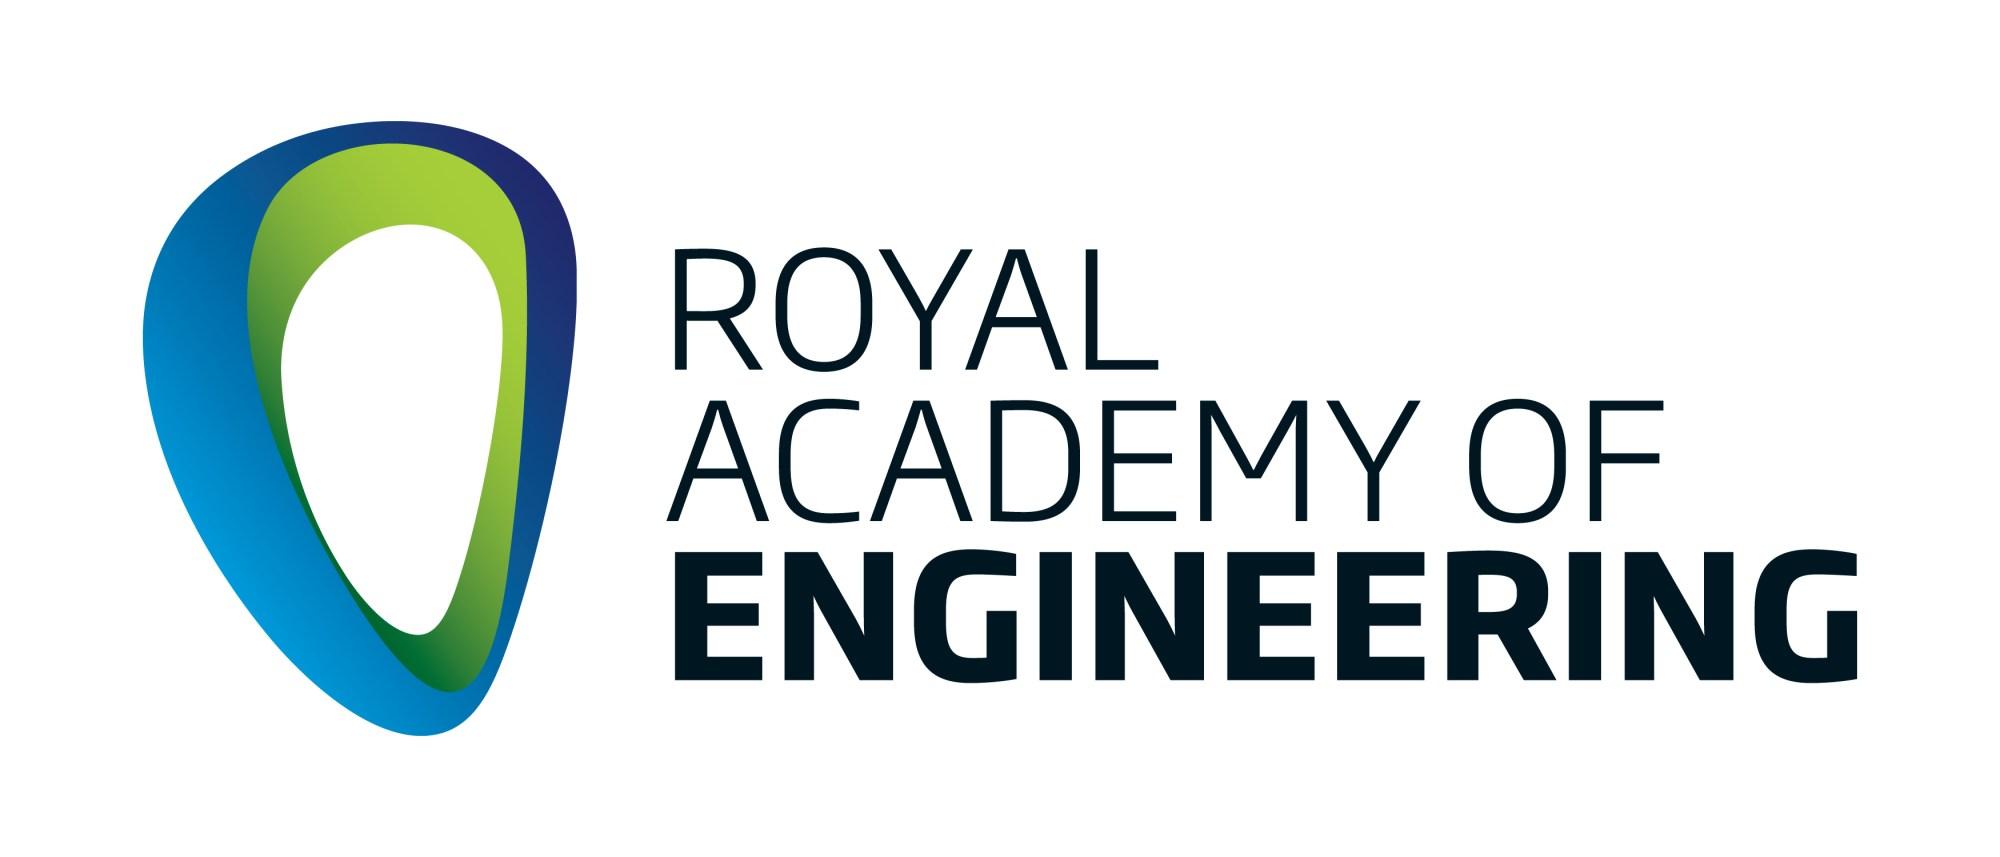 hight resolution of royal academy of engineering logo